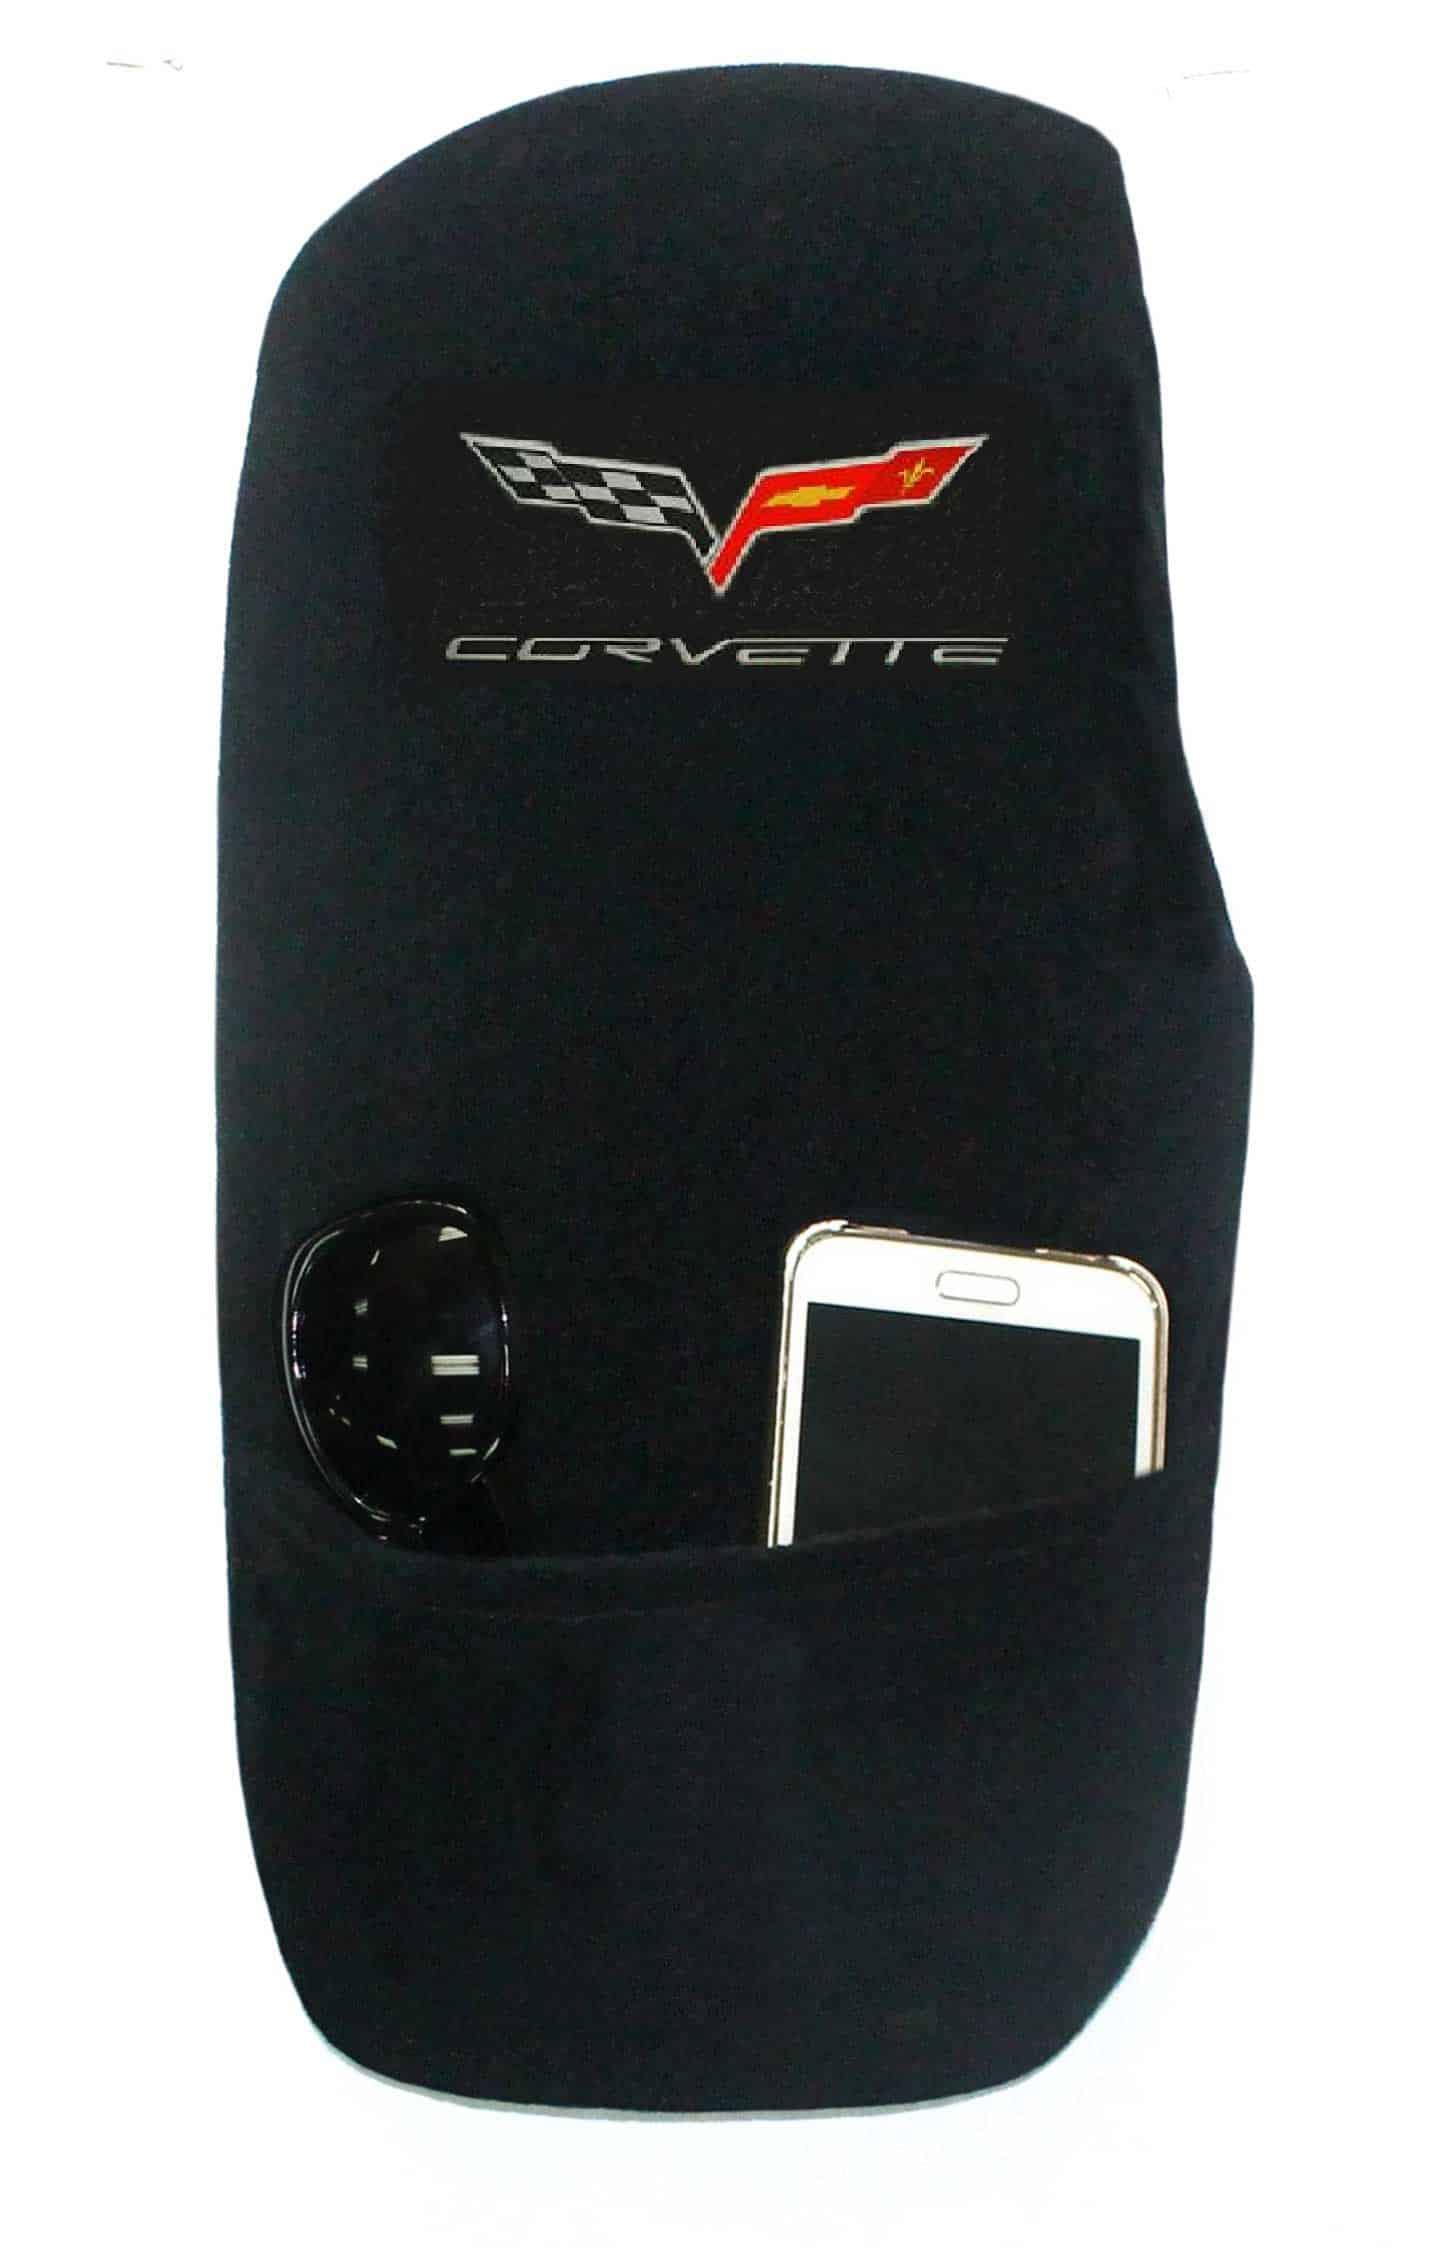 Borla C6 Corvette Exhaust